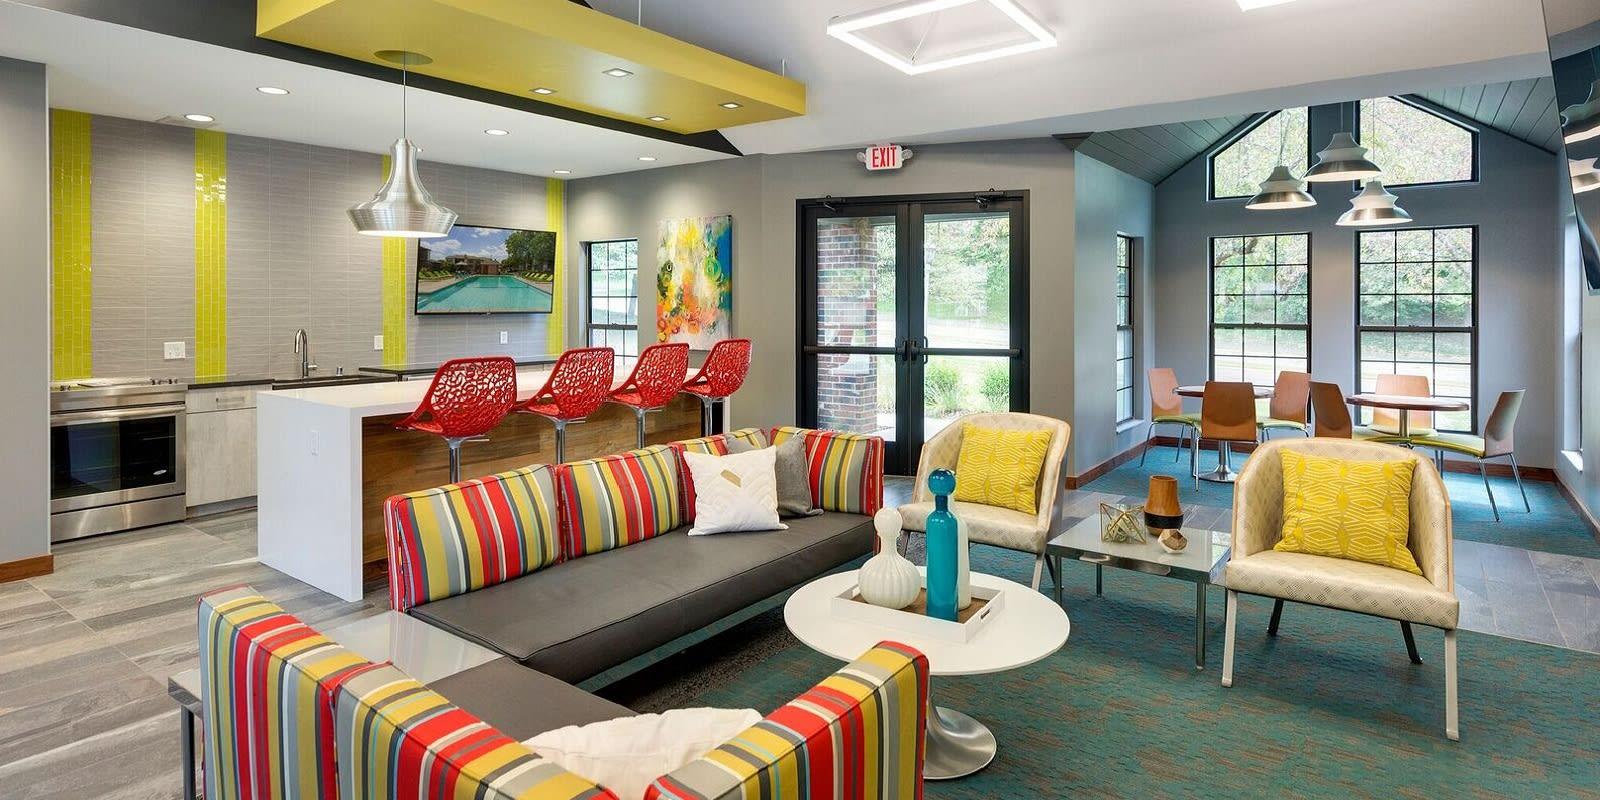 Eden Commons Apartments in Eden Prairie, MN Community Room